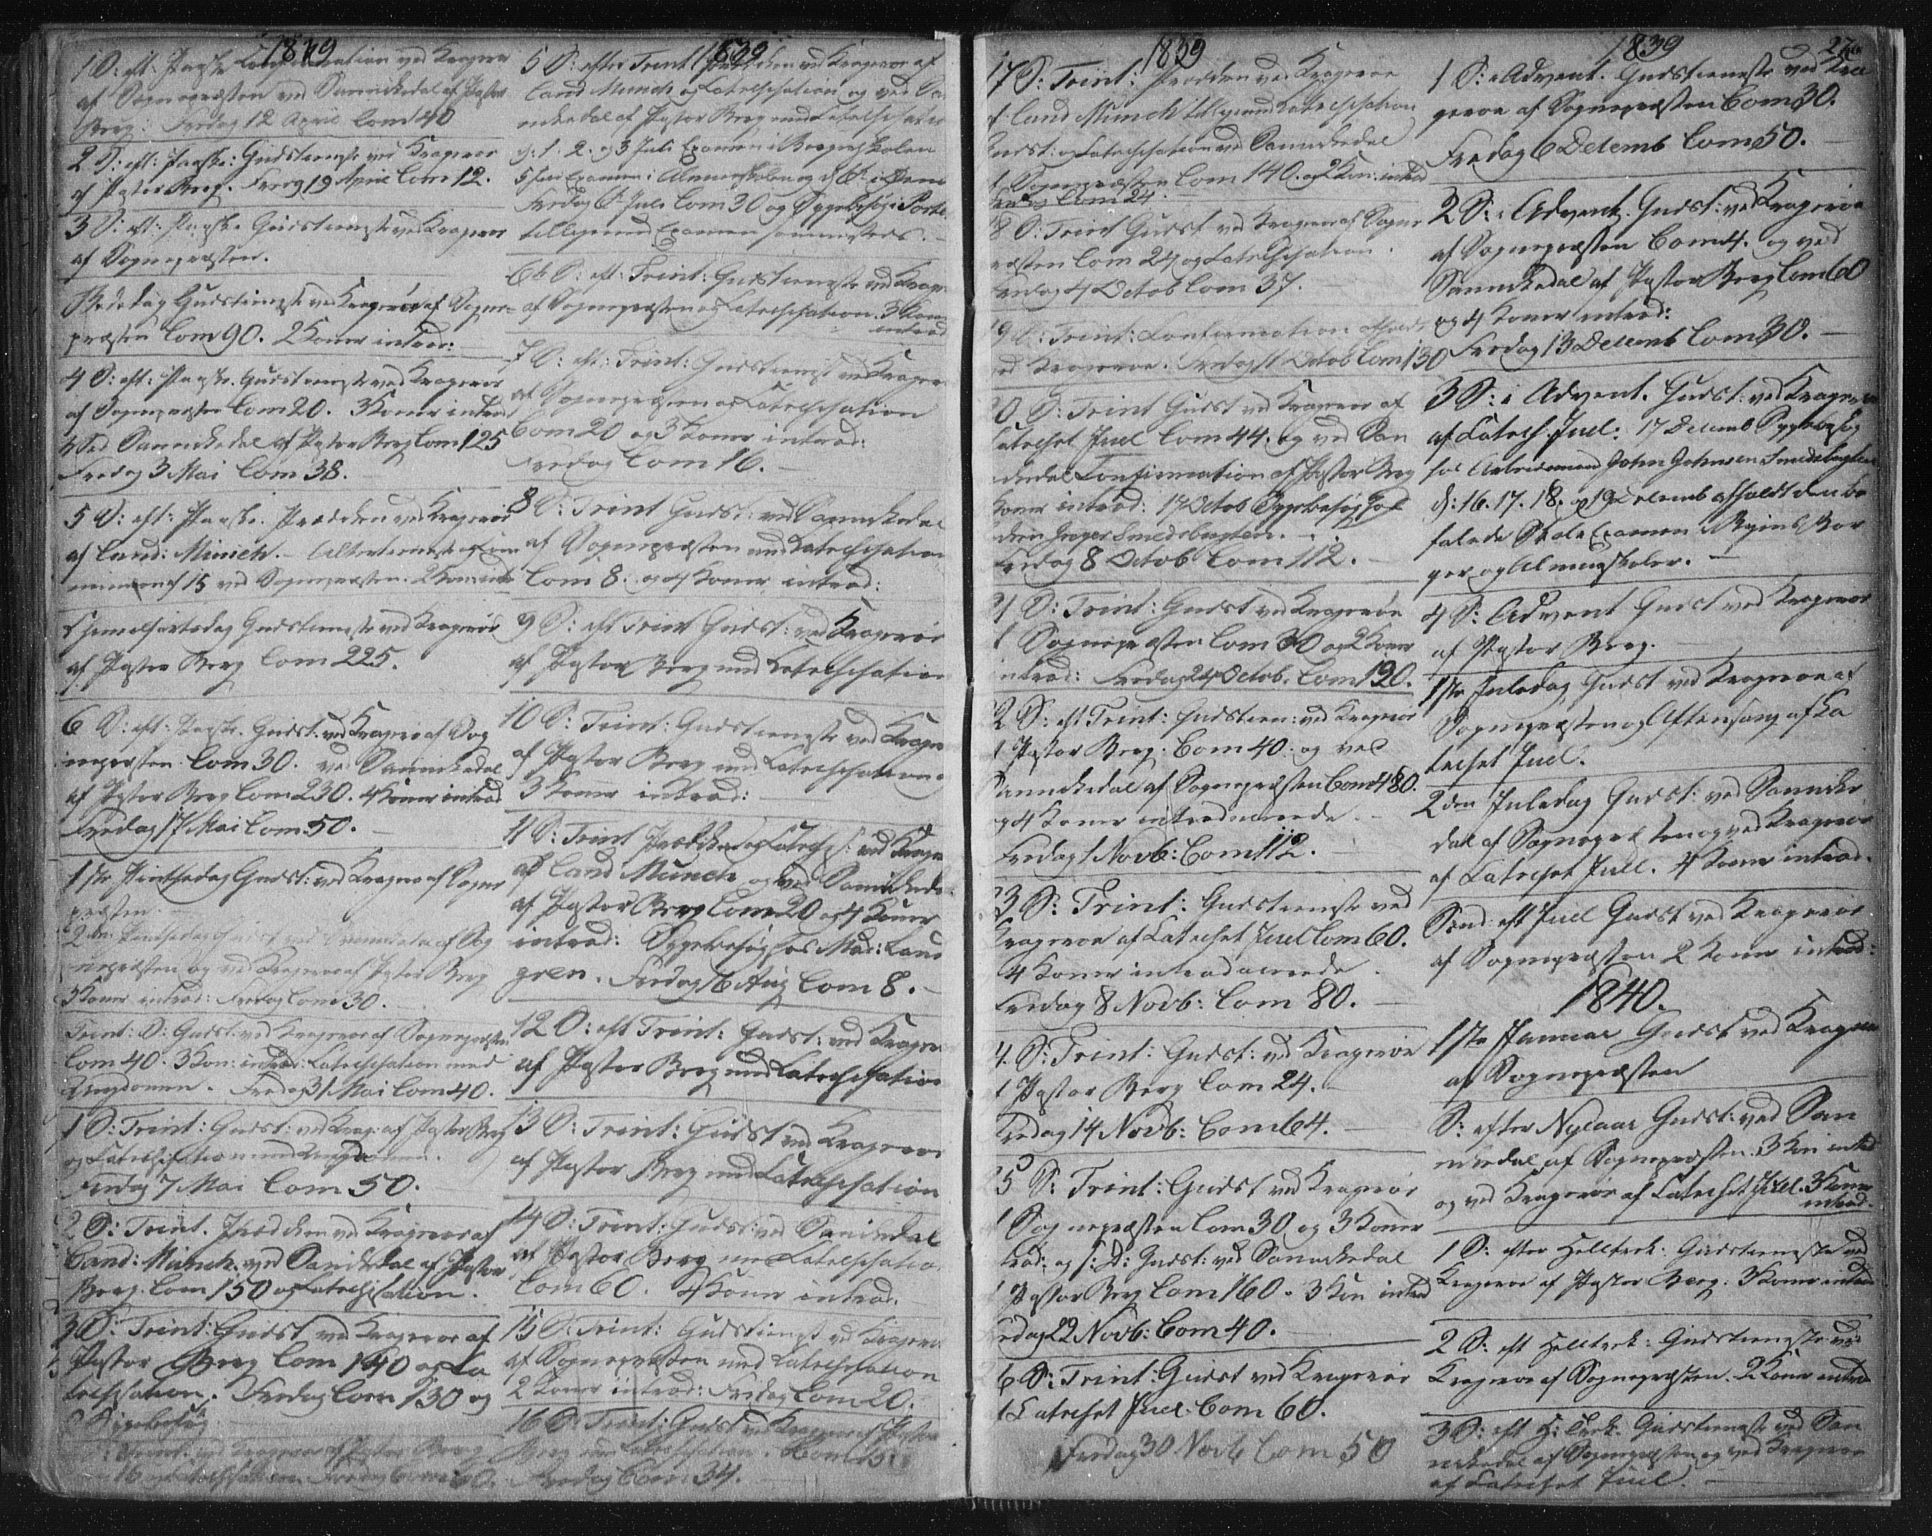 SAKO, Kragerø kirkebøker, F/Fa/L0005: Ministerialbok nr. 5, 1832-1847, s. 276